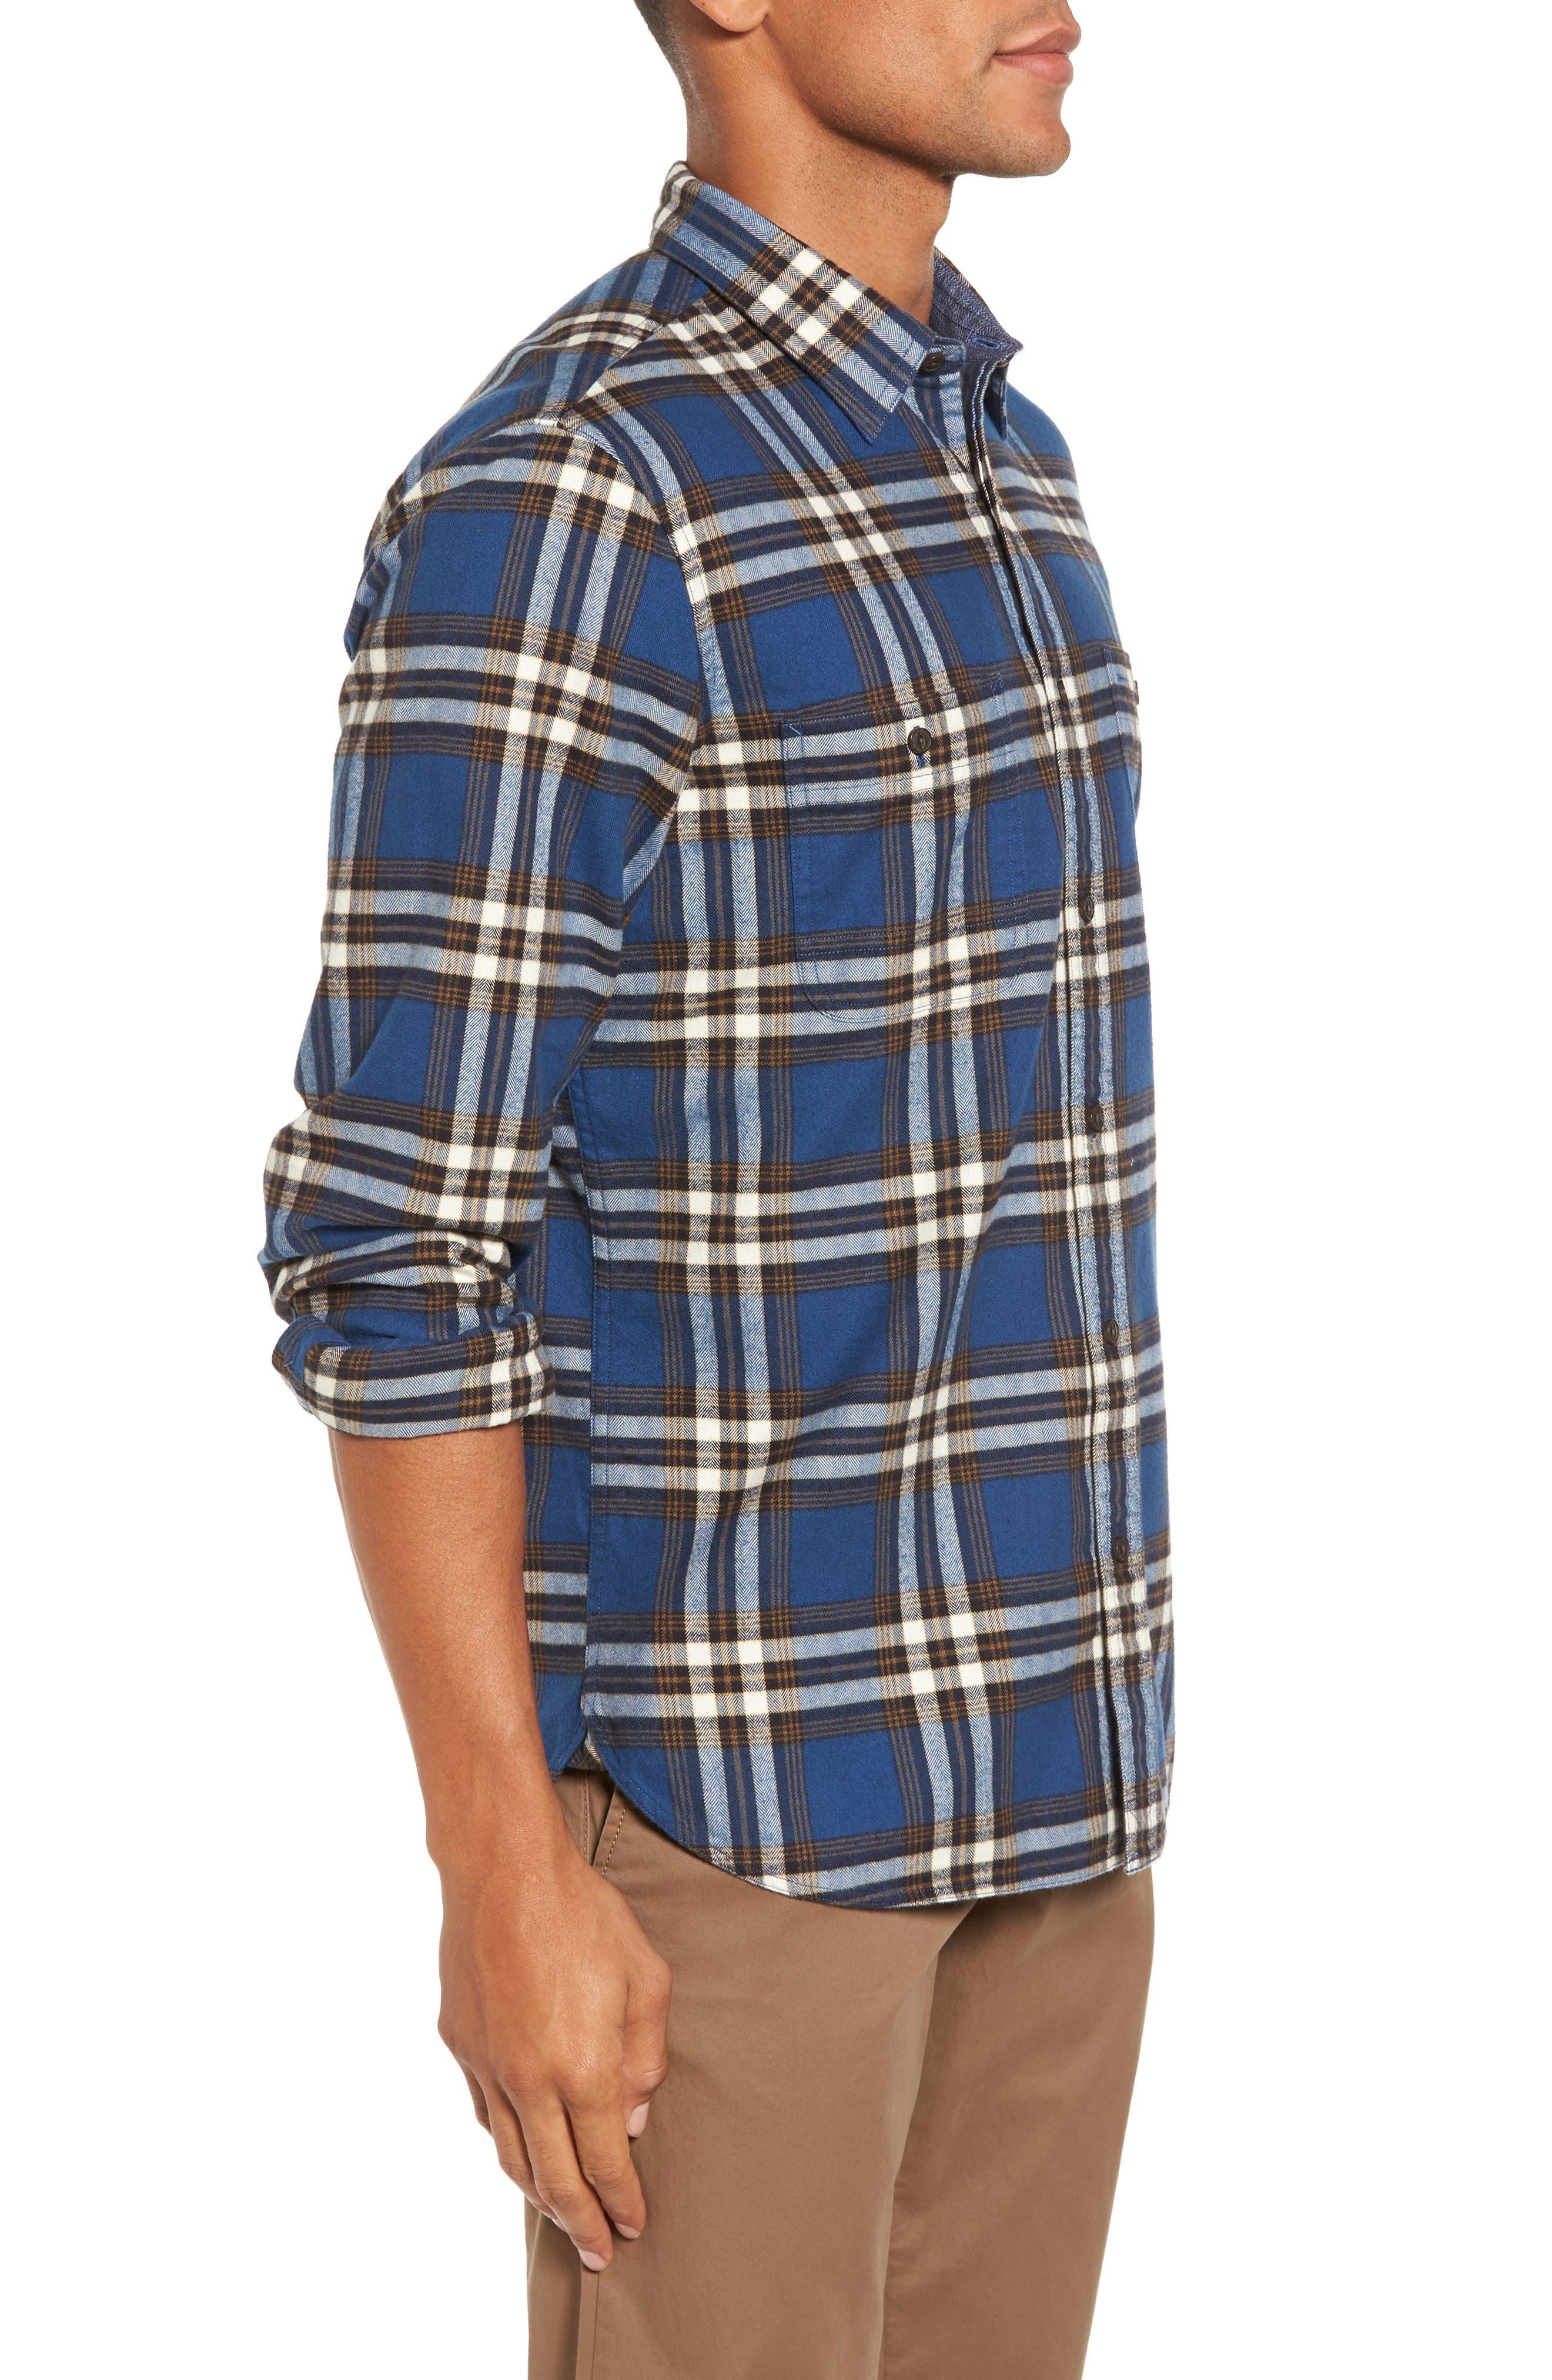 Trim Fit Workwear Check Flannel Shirt,                             Alternate thumbnail 3, color,                             Blue Vintage Brown Plaid